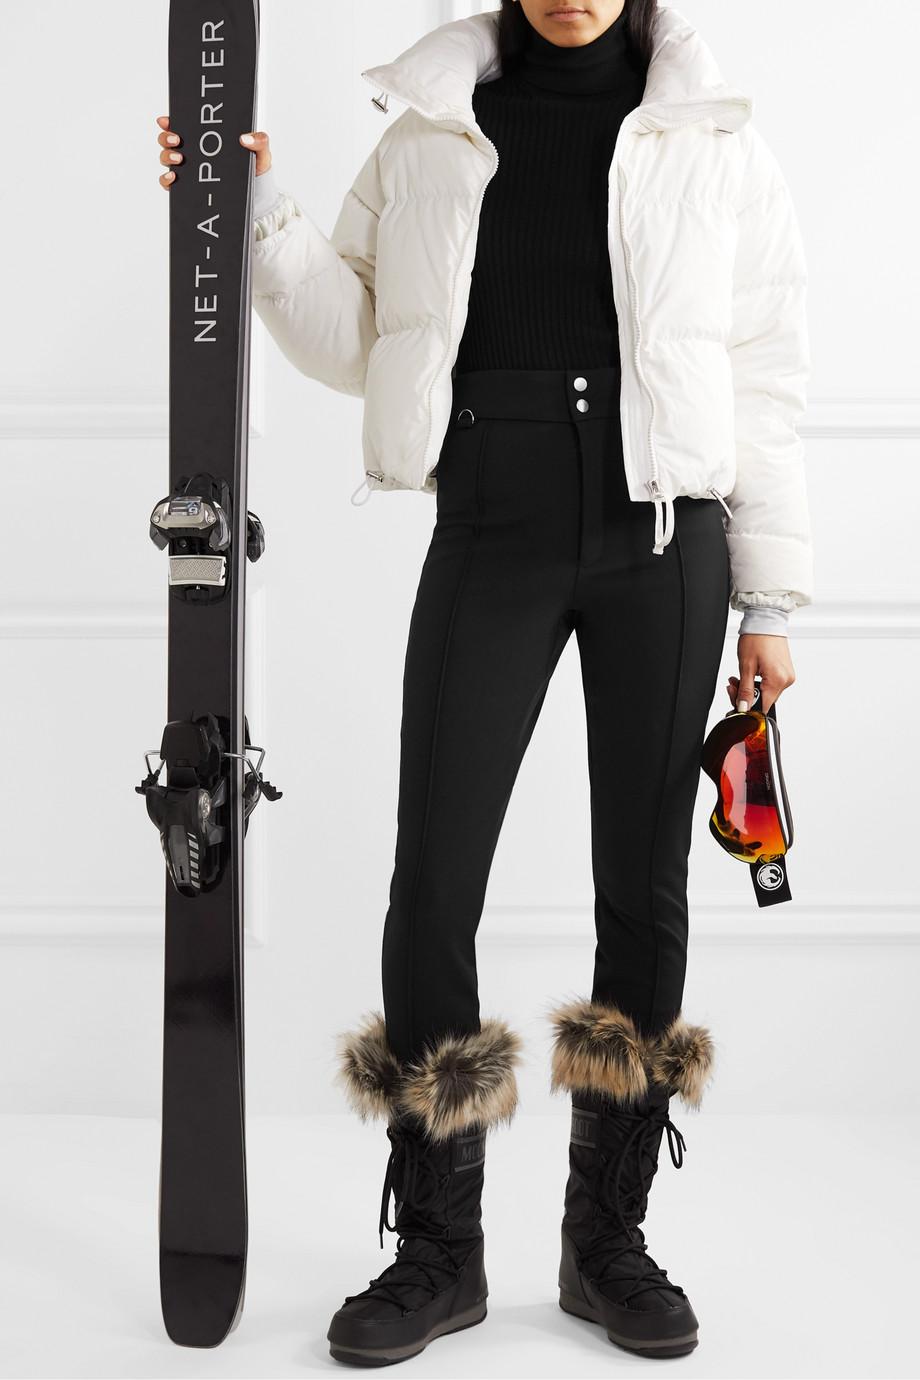 Cordova Pantalon de ski slim en tissu technique stretch Val d'Isère